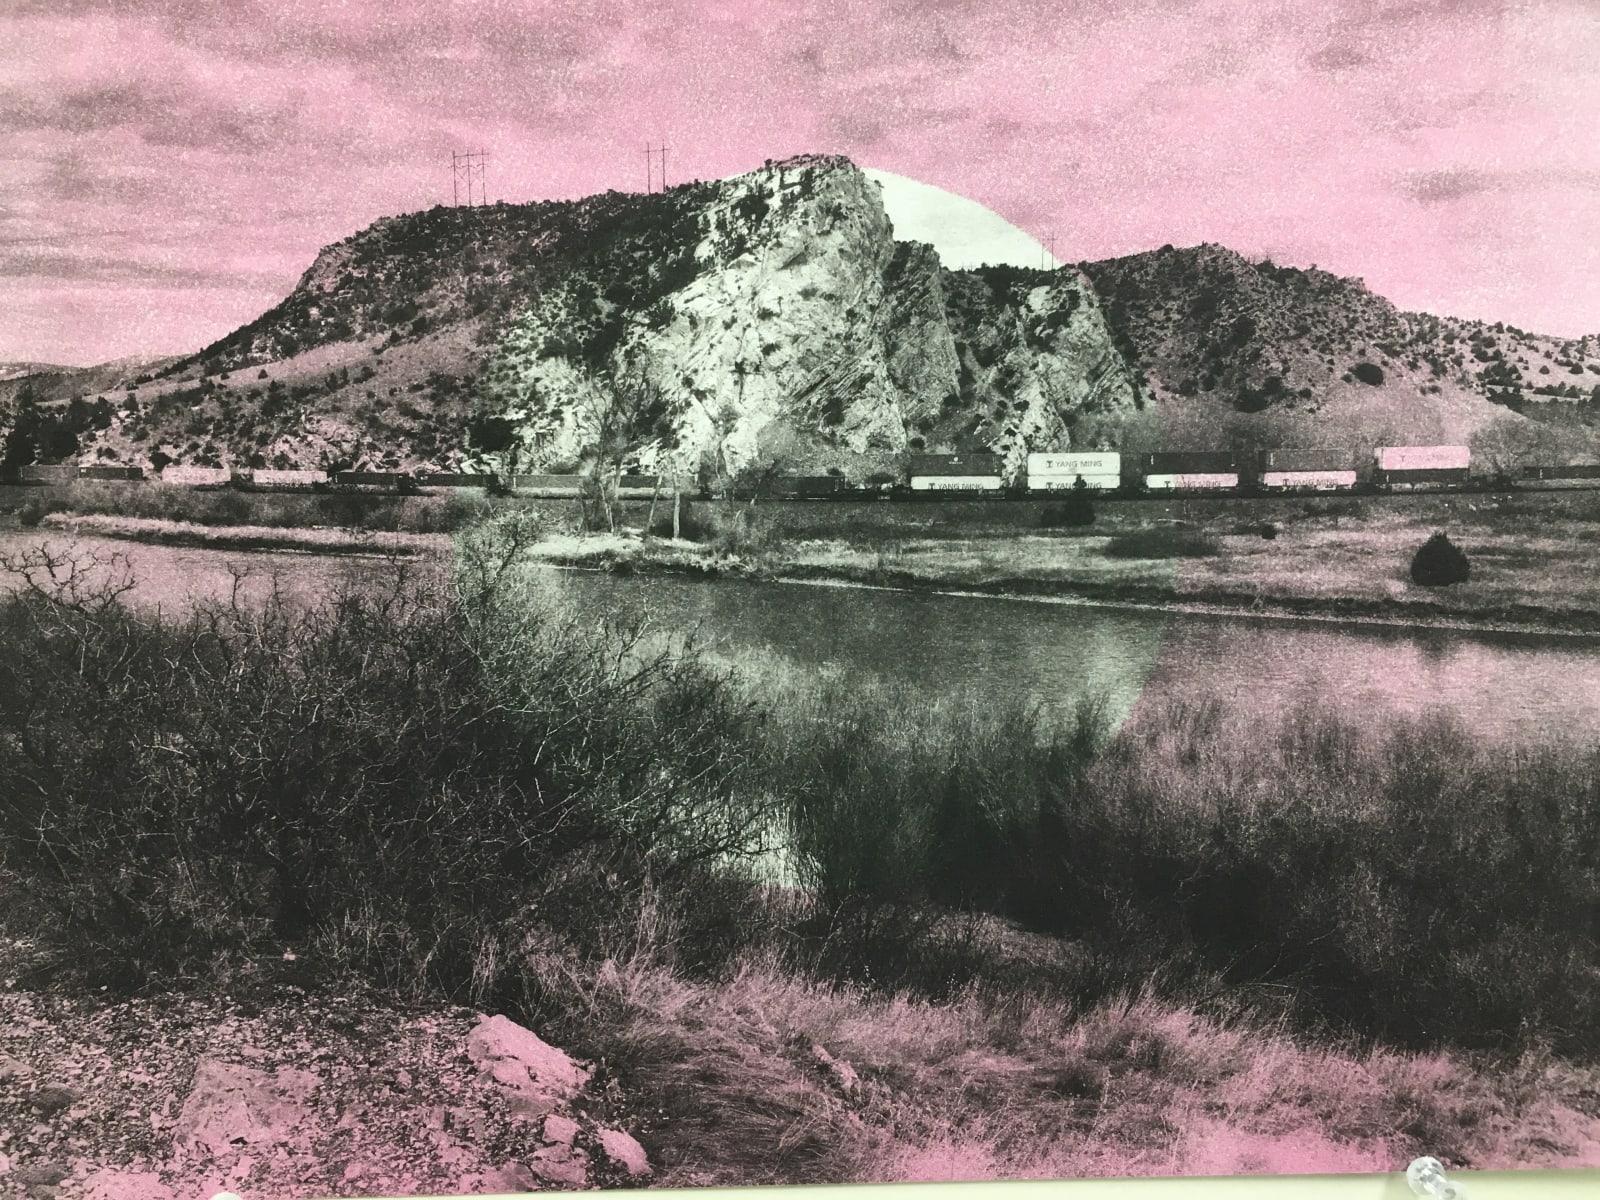 Gesine Janzen, Cherry River, Lewis Rock, Yang Ming, 2019